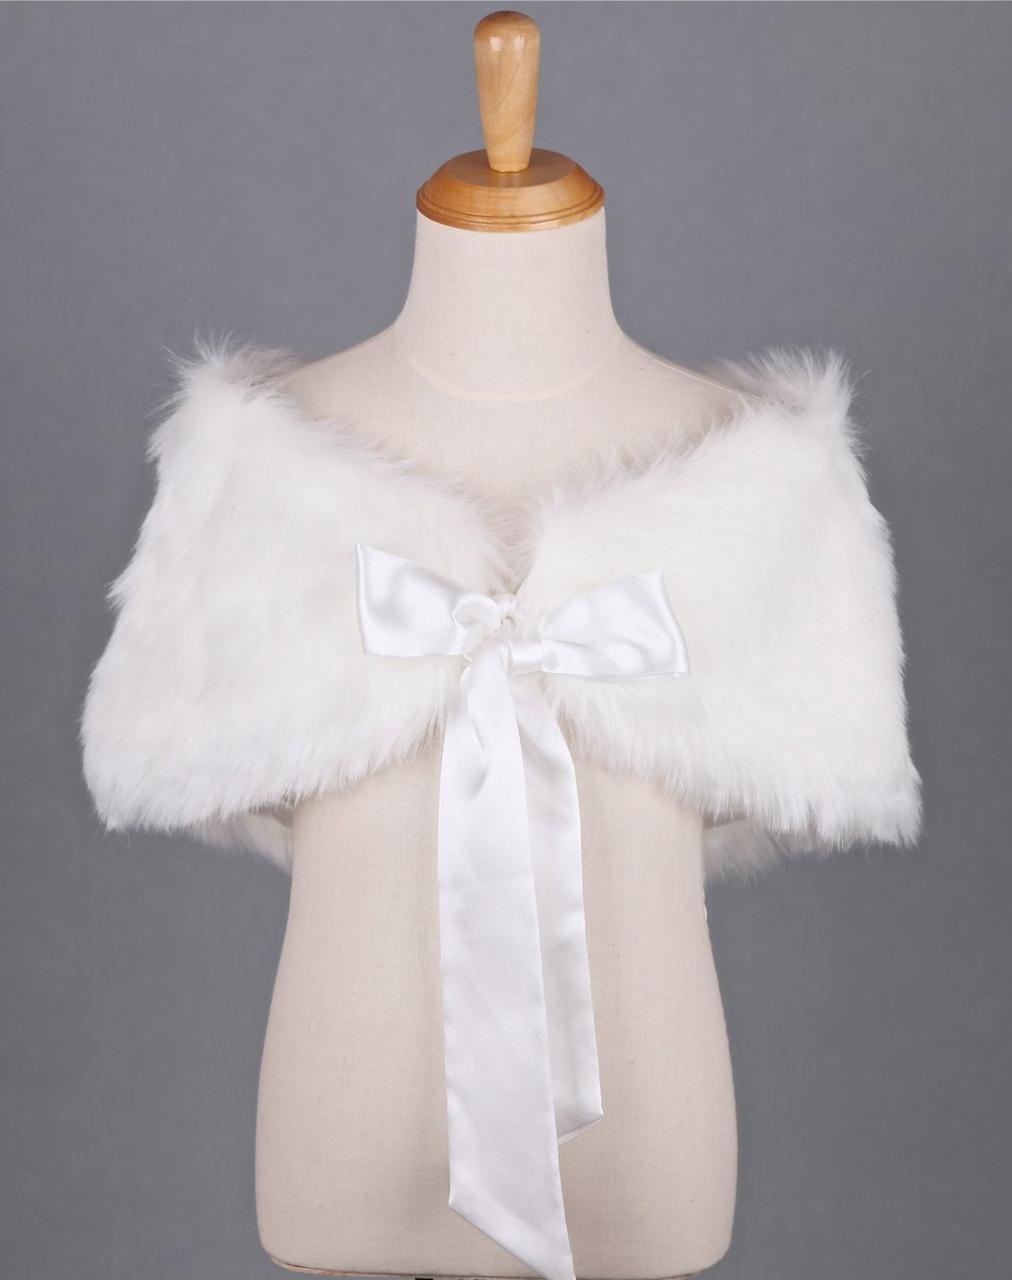 beea4d725a1 Faux Fur Wrap Bridal Bridesmaids Wedding - Angel Fashion ltd